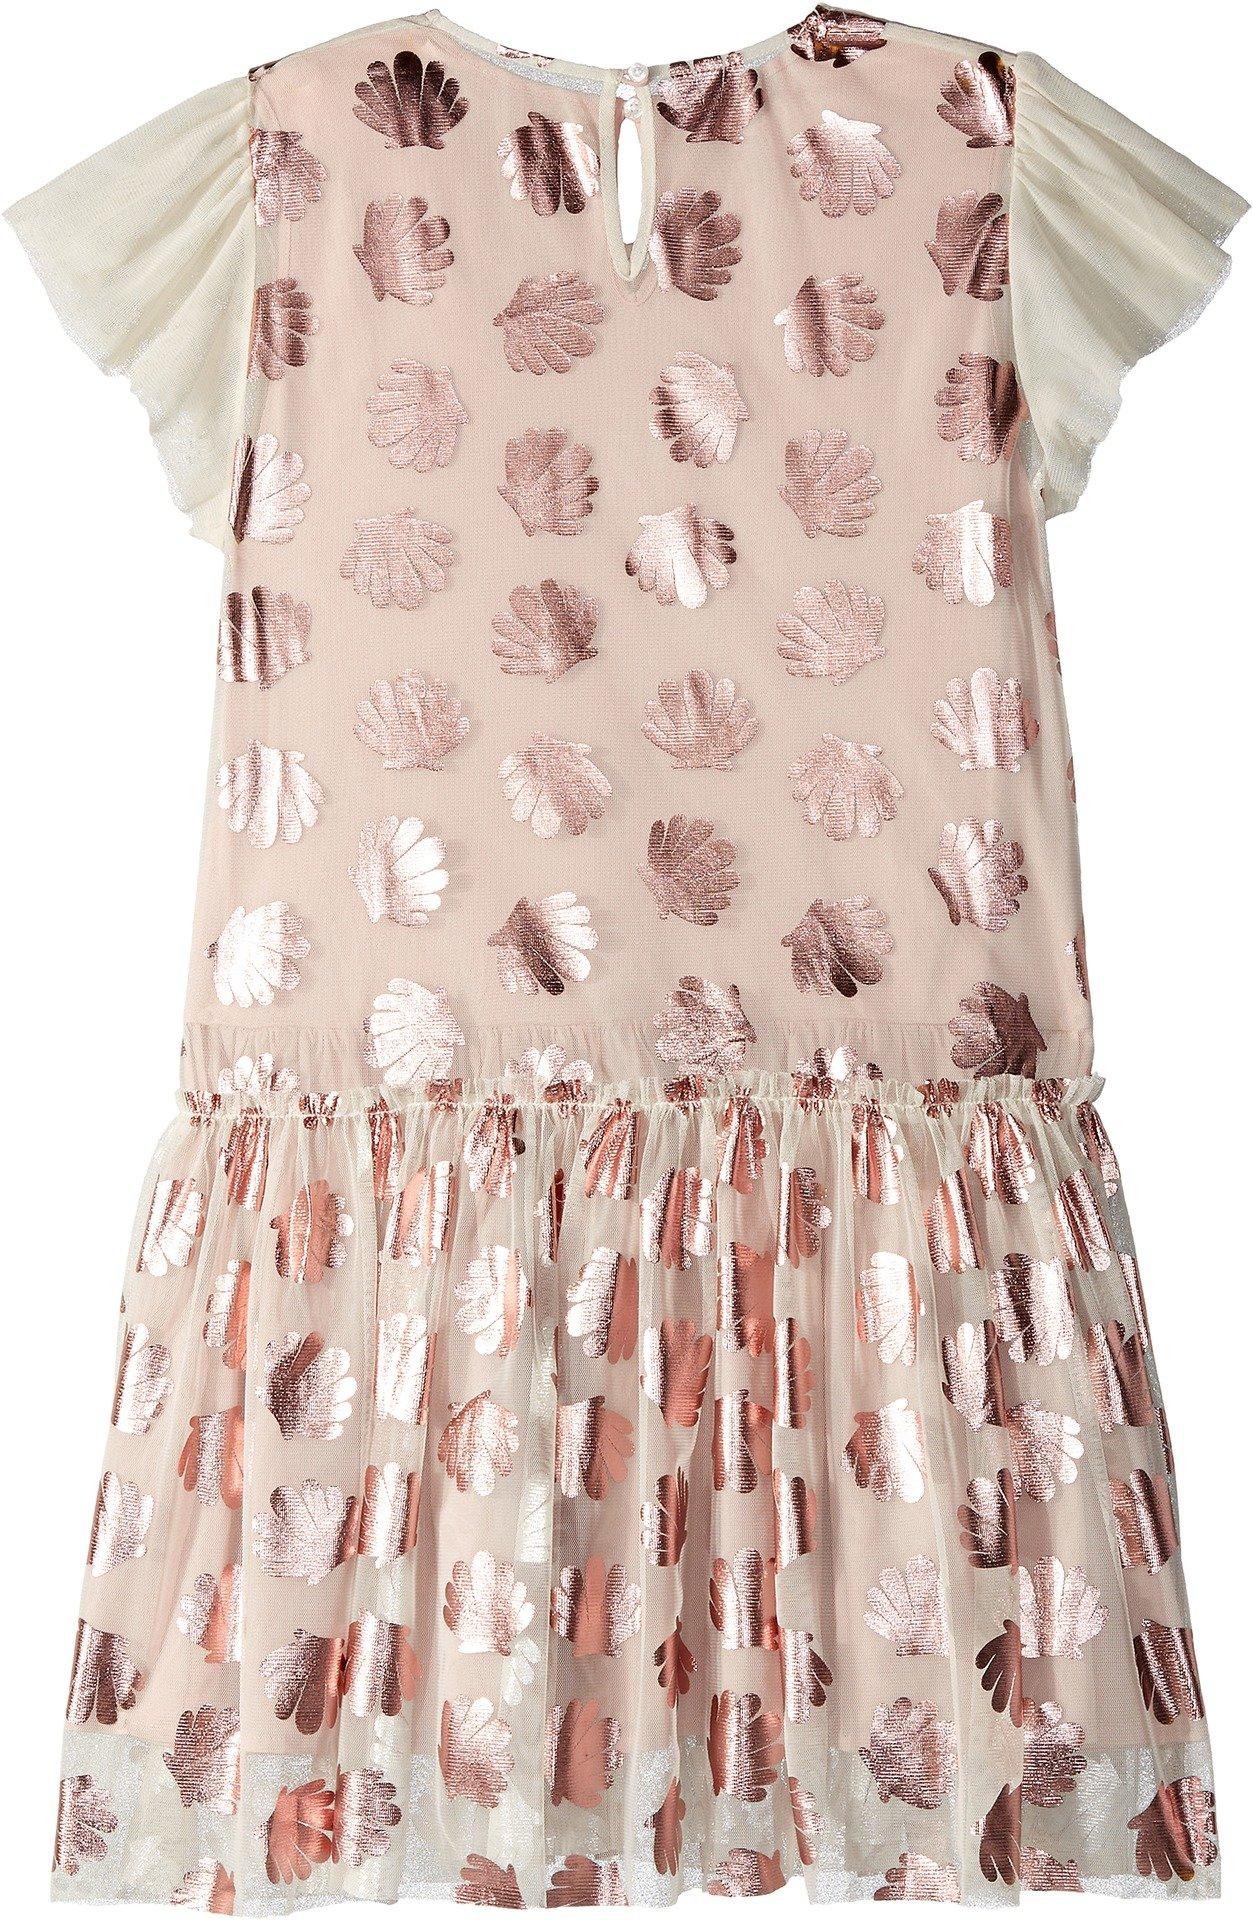 Stella McCartney Kids Baby Girl's Bellie Tulle Dress w/Metallic Seashells (Toddler/Little Kids/Big Kids) Pink 4T by Stella McCartney Kids (Image #2)